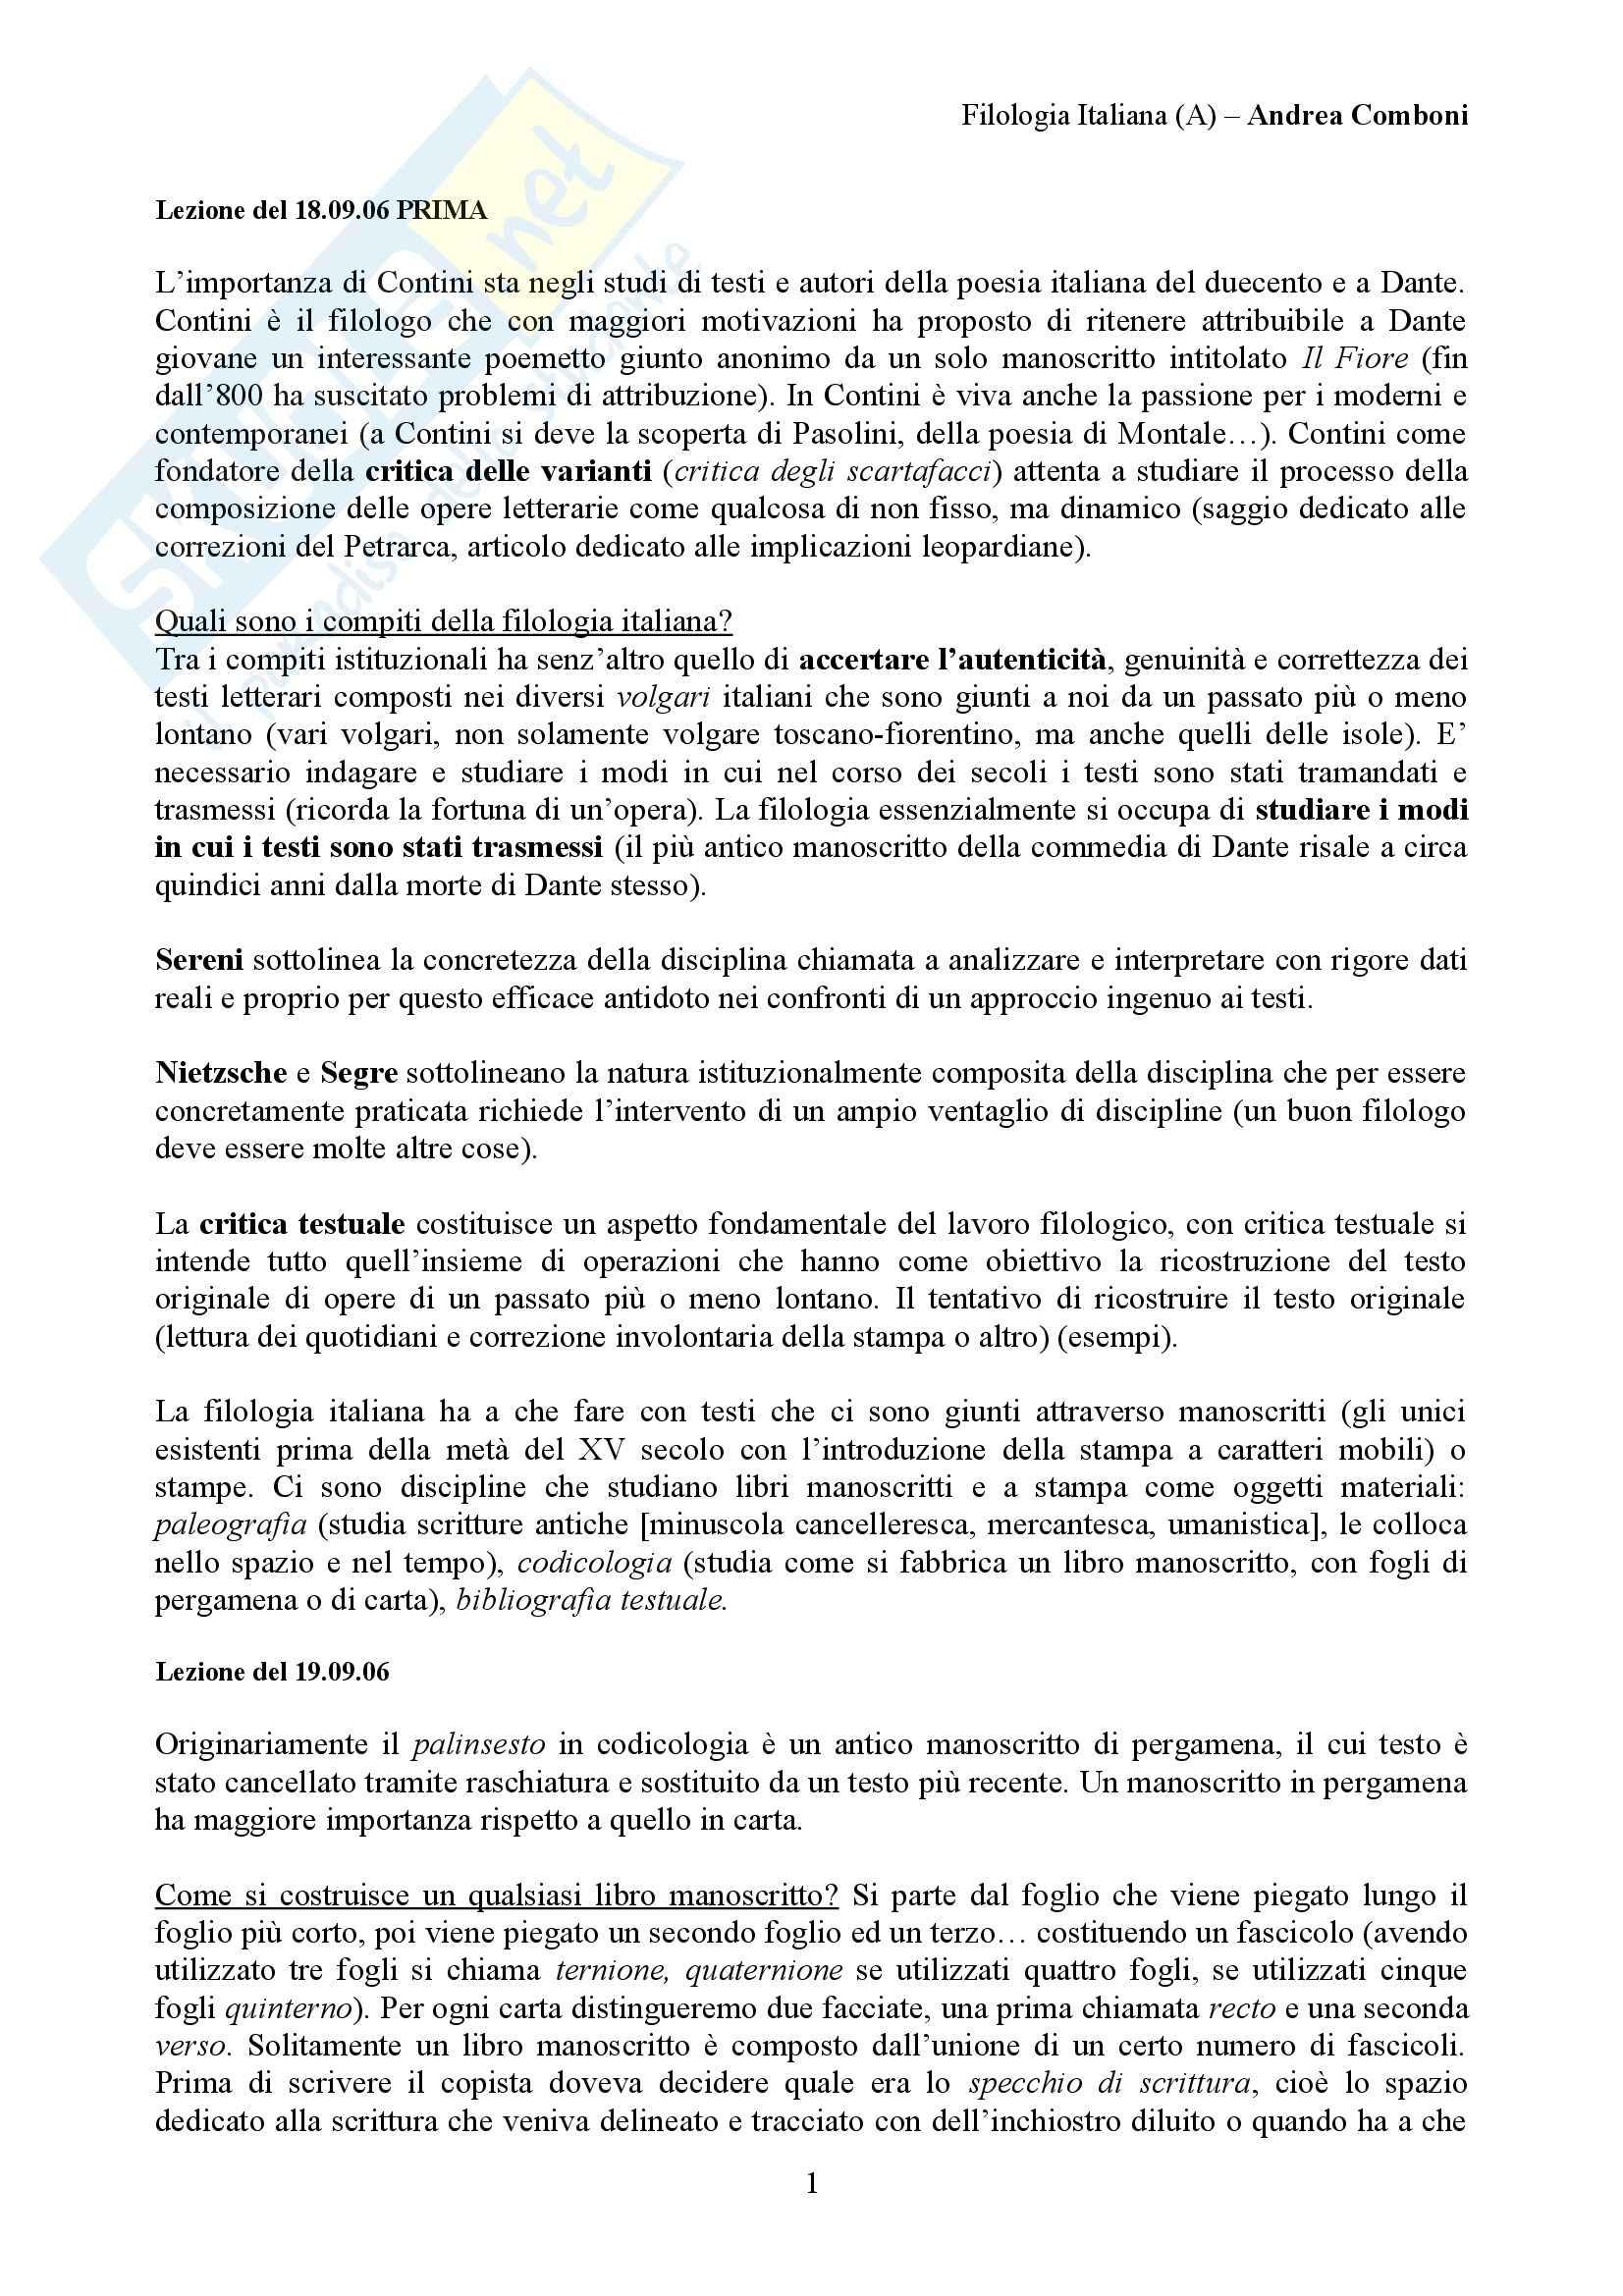 Filologia italiana - lezioni